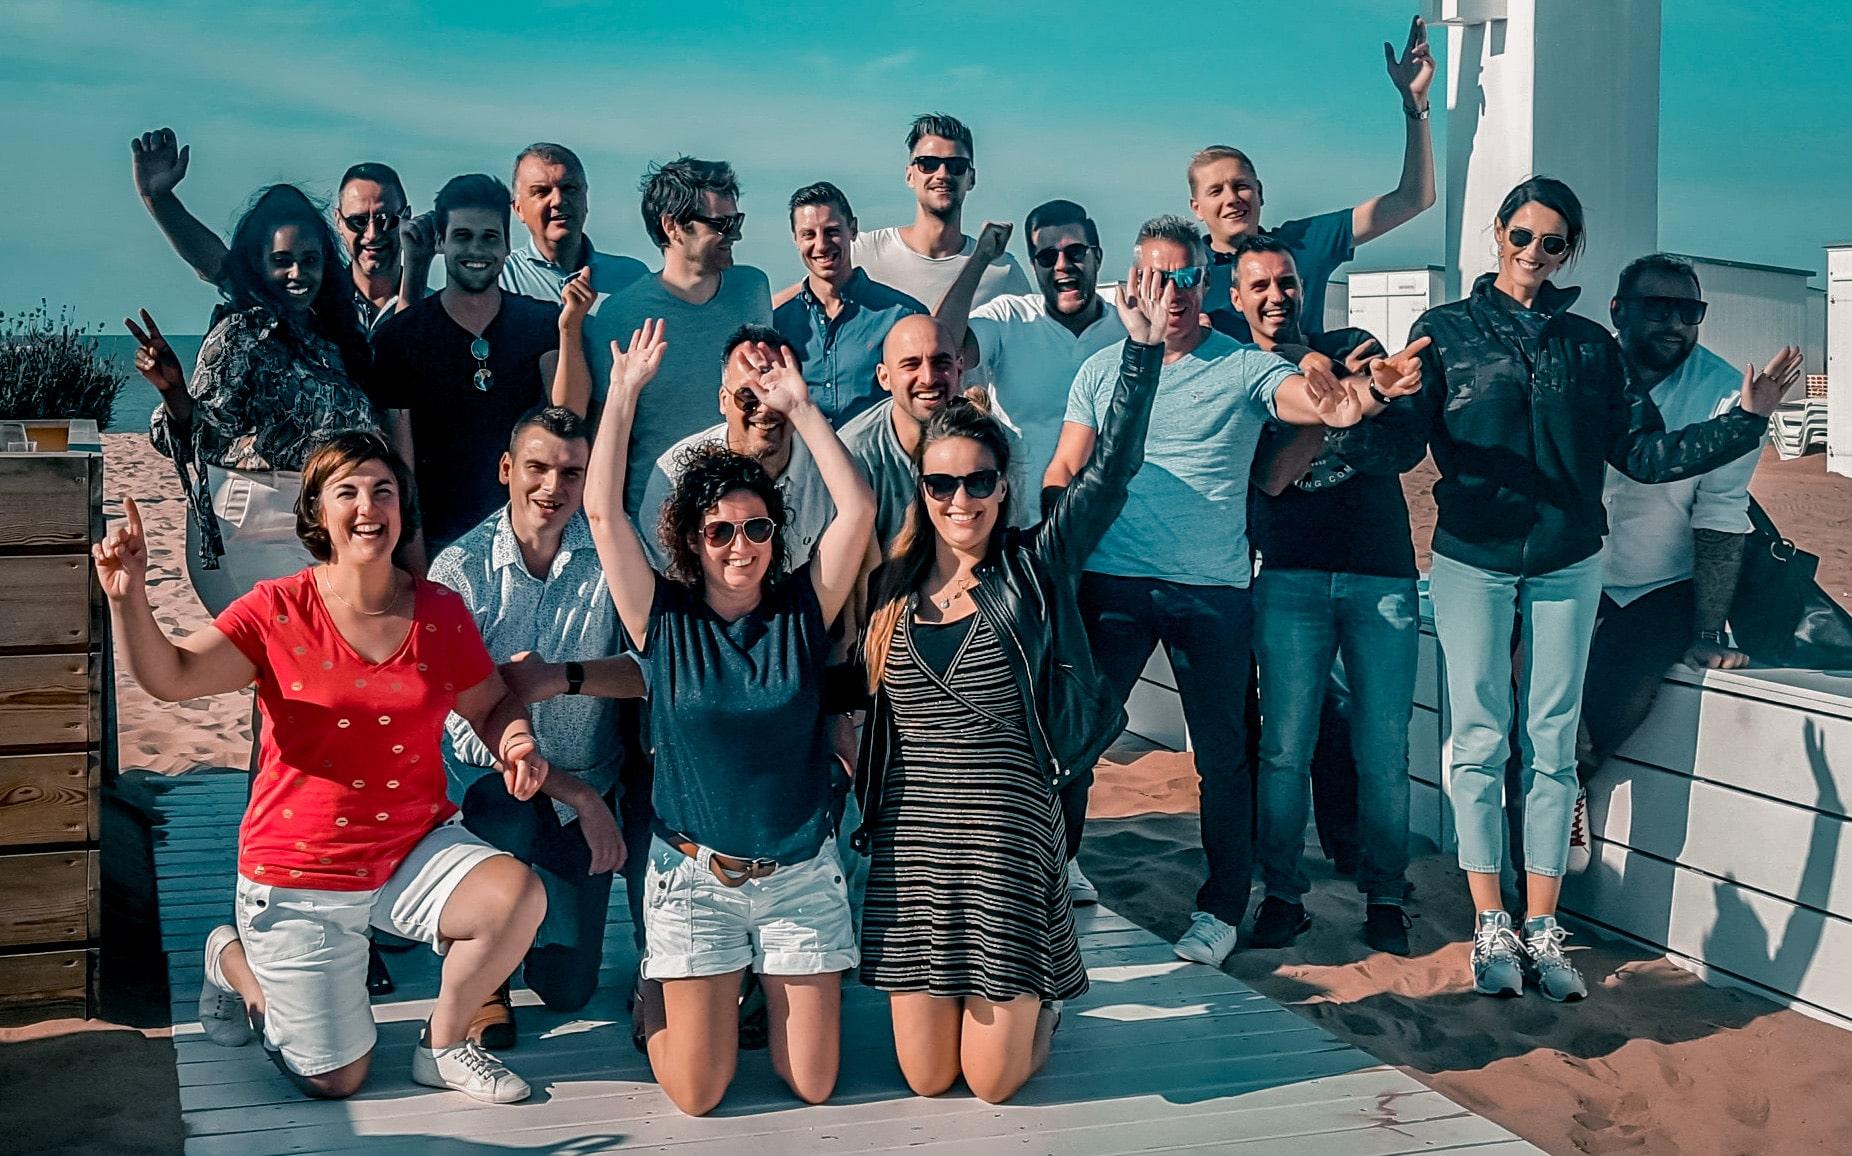 Alcobrands team group photo